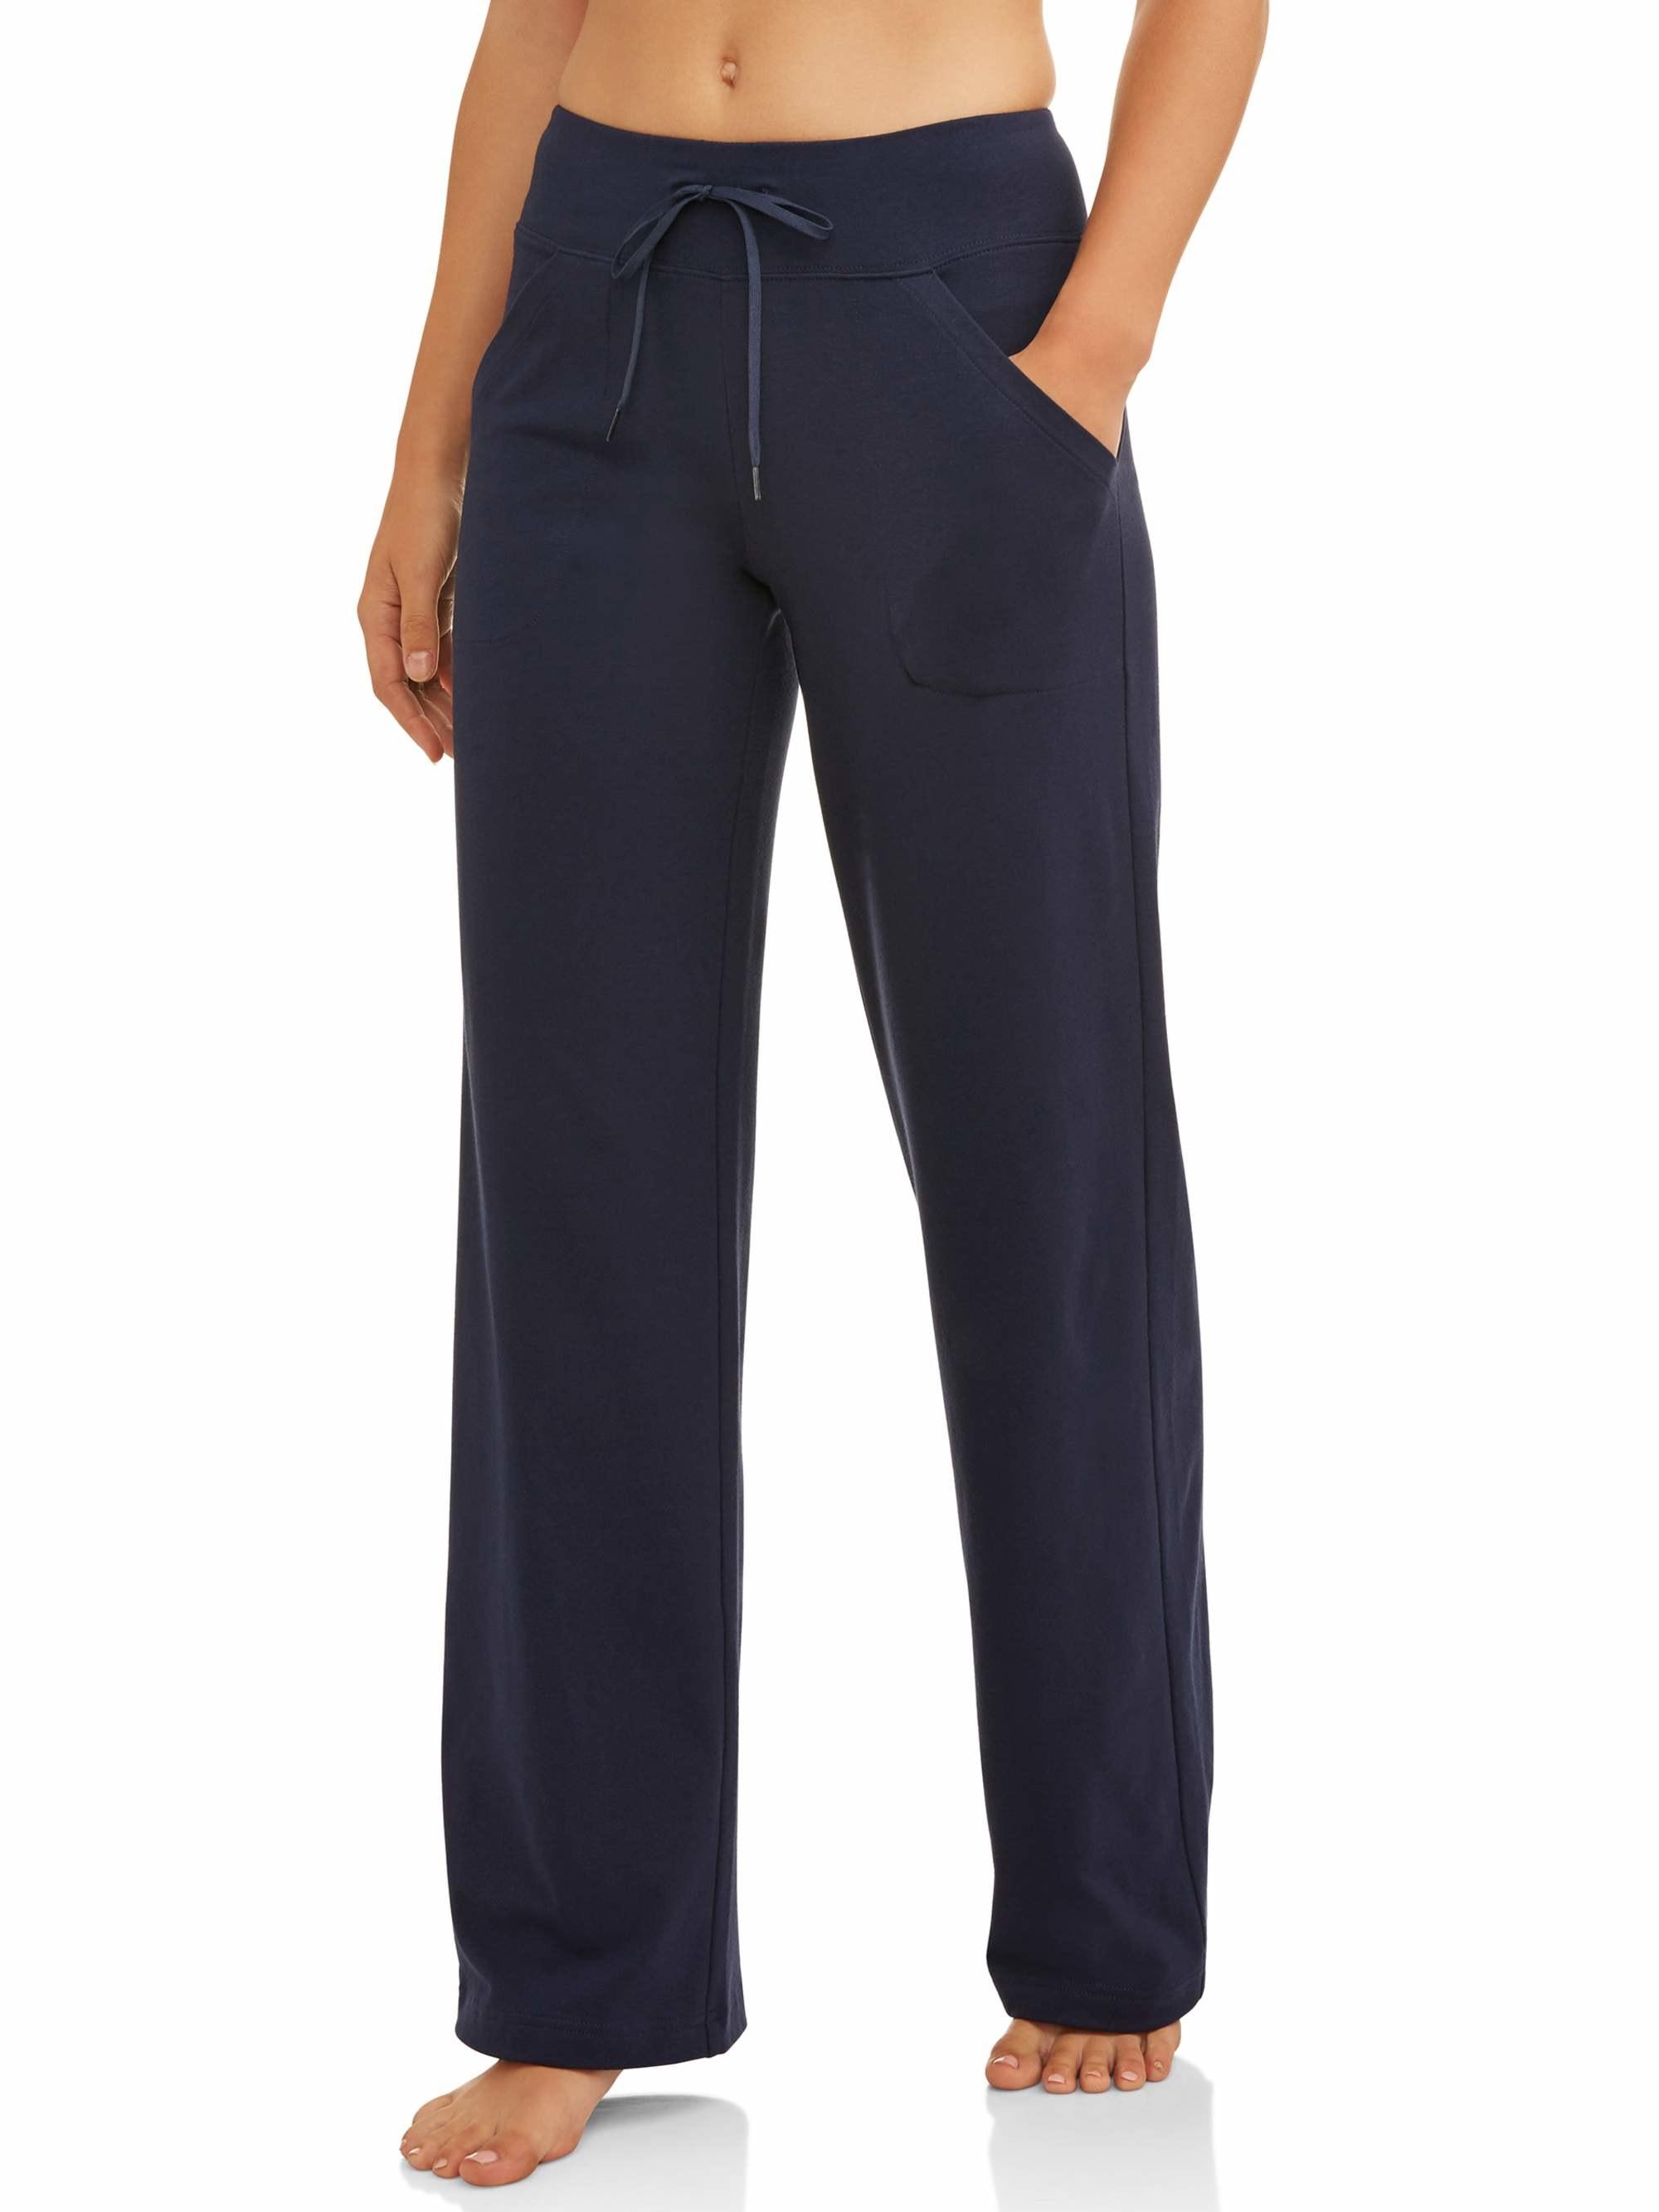 The navy blue wide-hem sweatpants